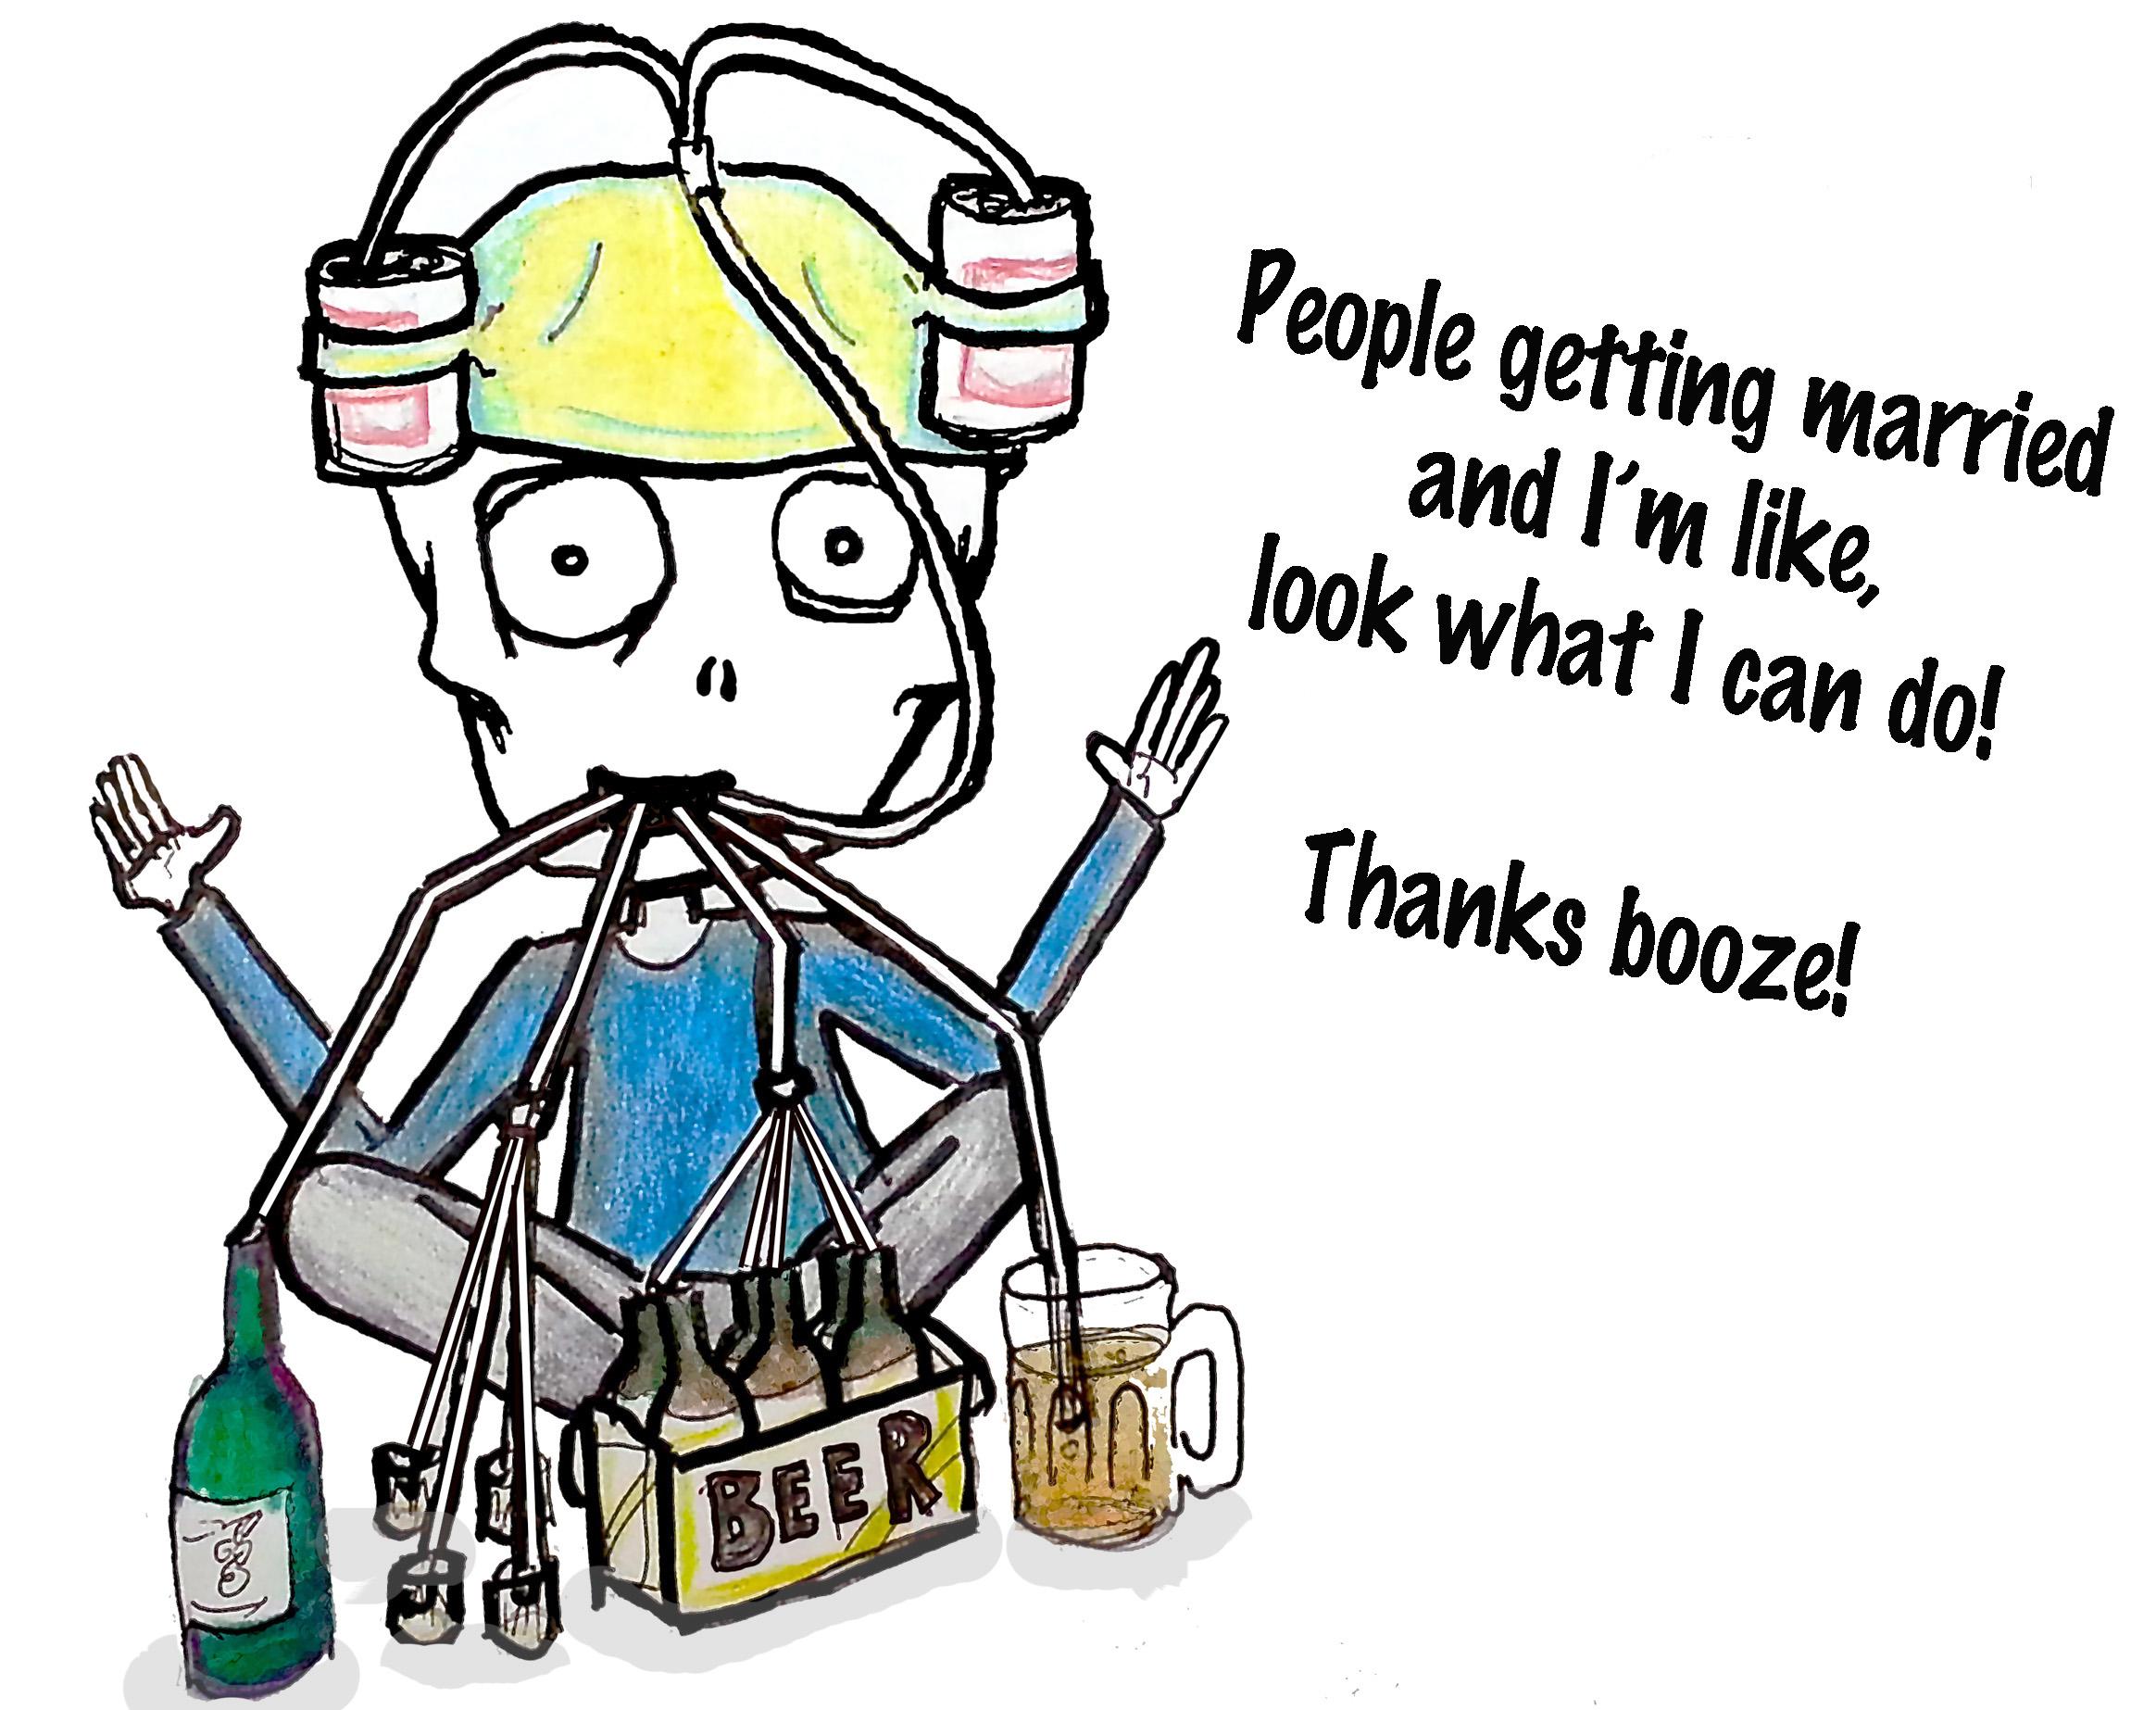 Thanks Booze